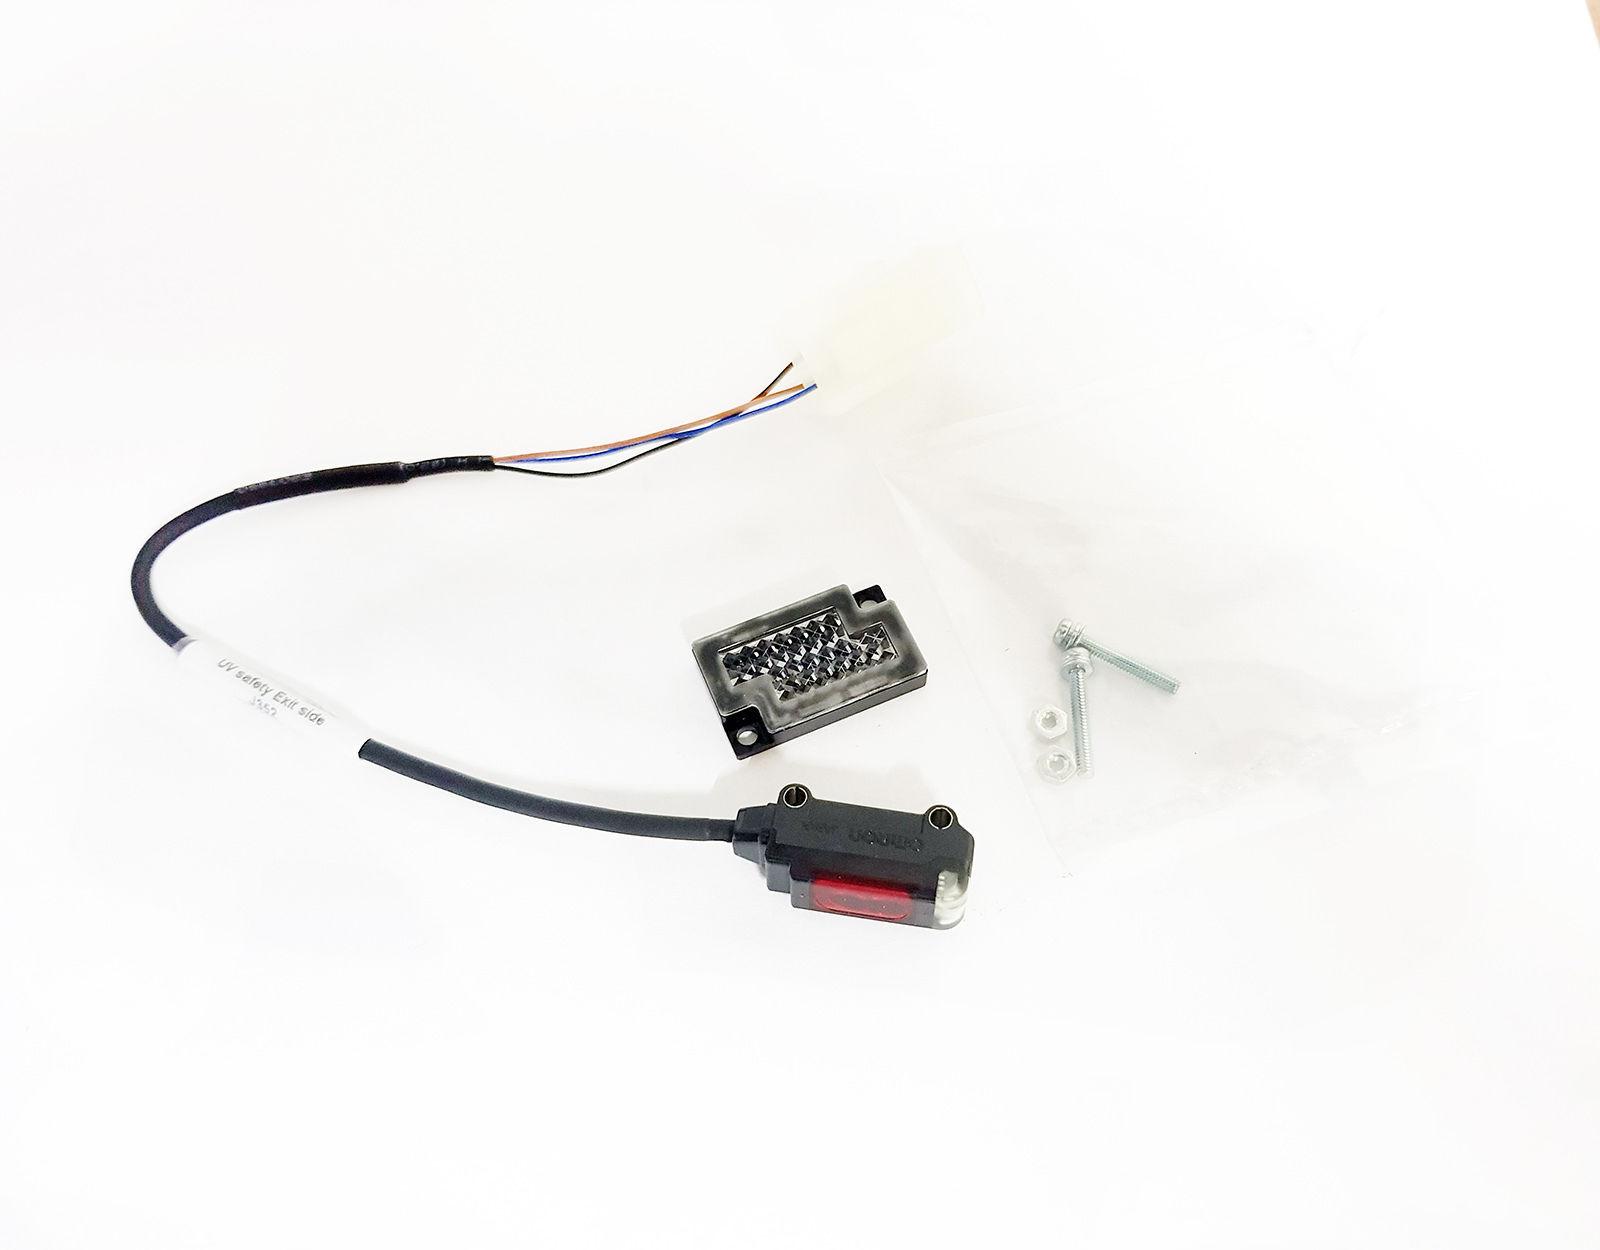 Omron Belt 47 Listings Power Relay G7l E3t Sr23 Miniature Square Photoelectric Sensor Switch 12 24 Vdc 2m 3634 Gbp